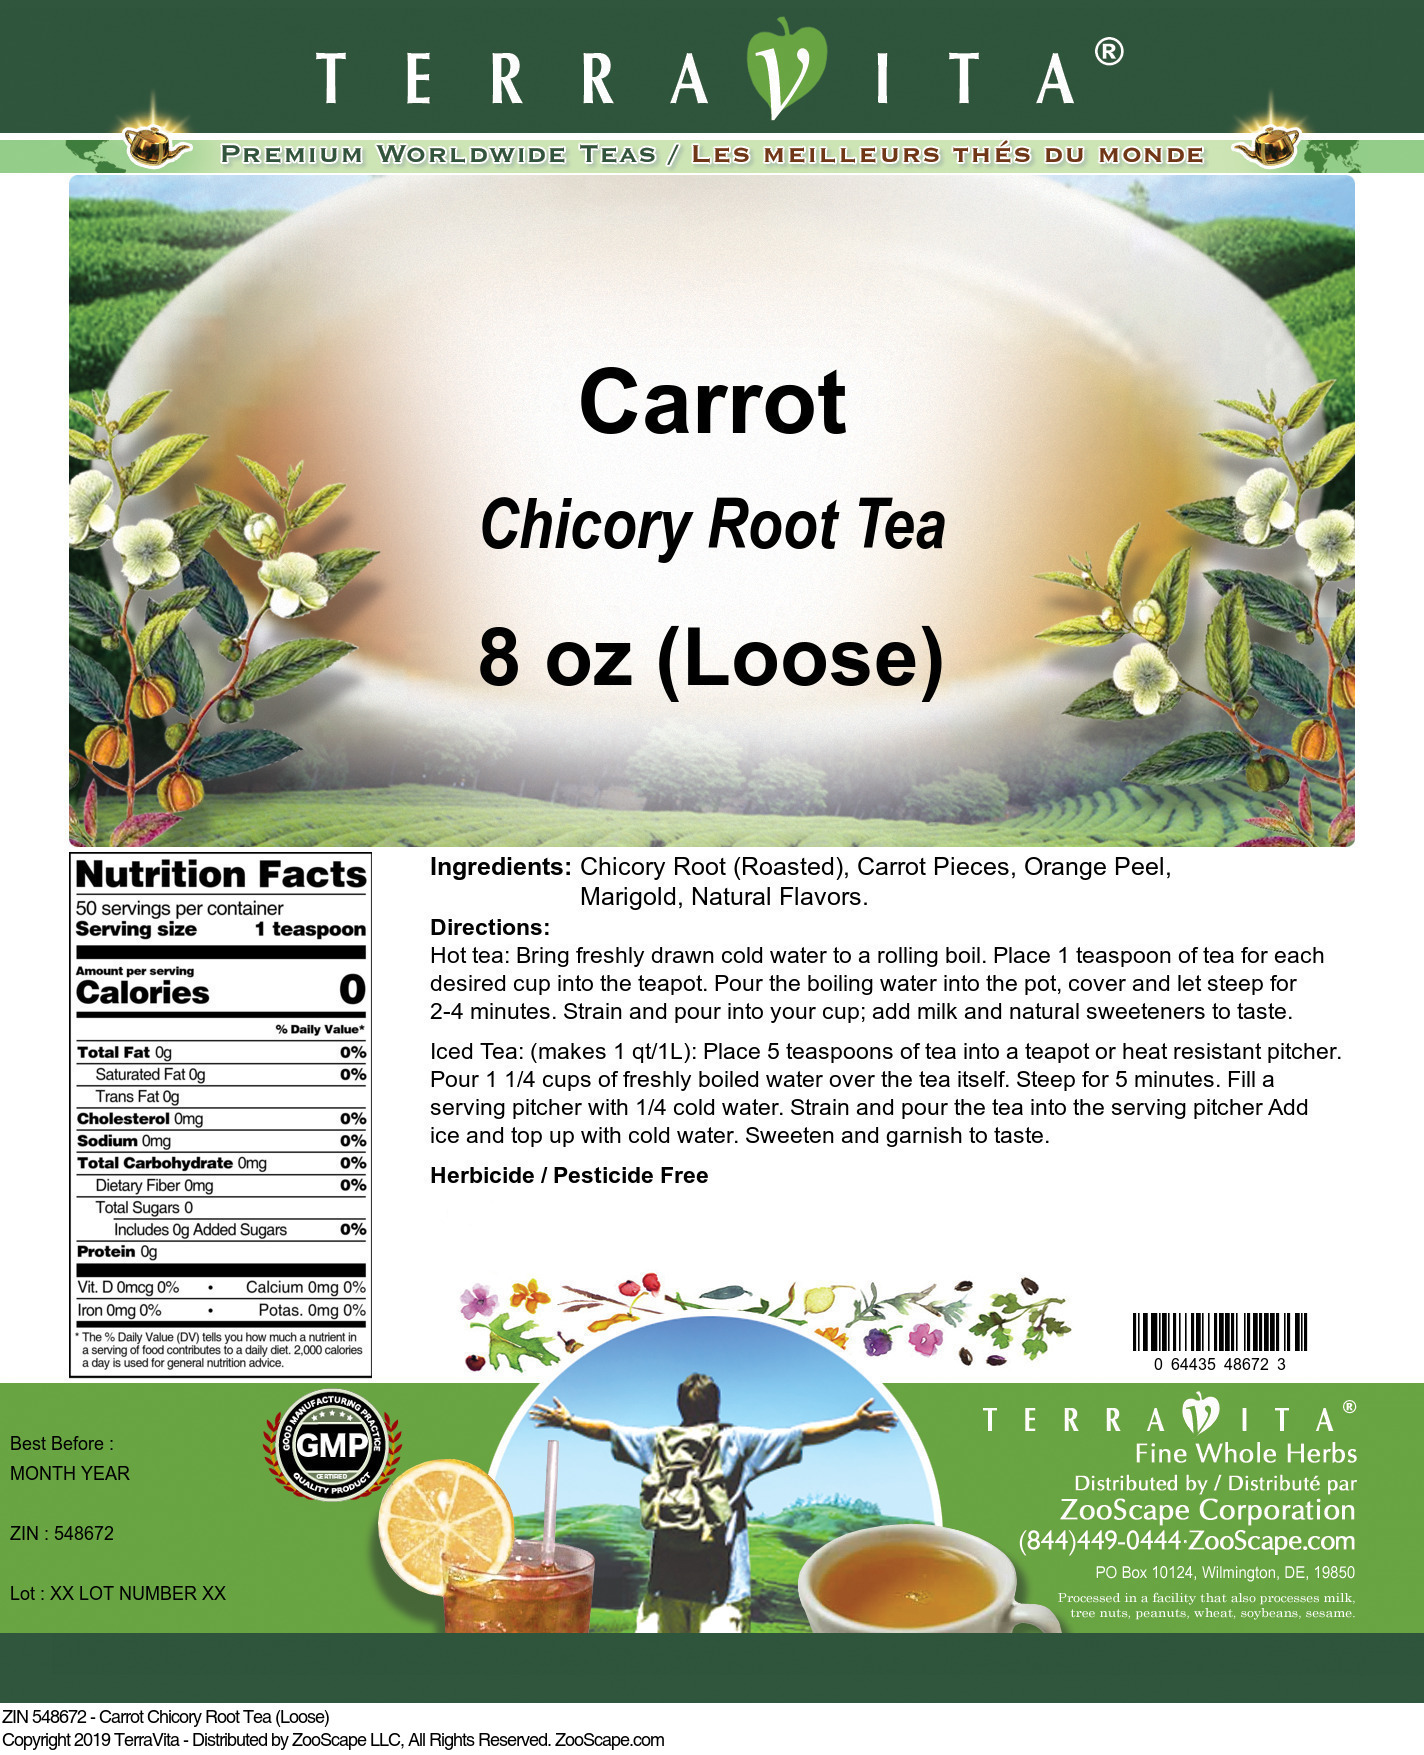 Carrot Chicory Root Tea (Loose)